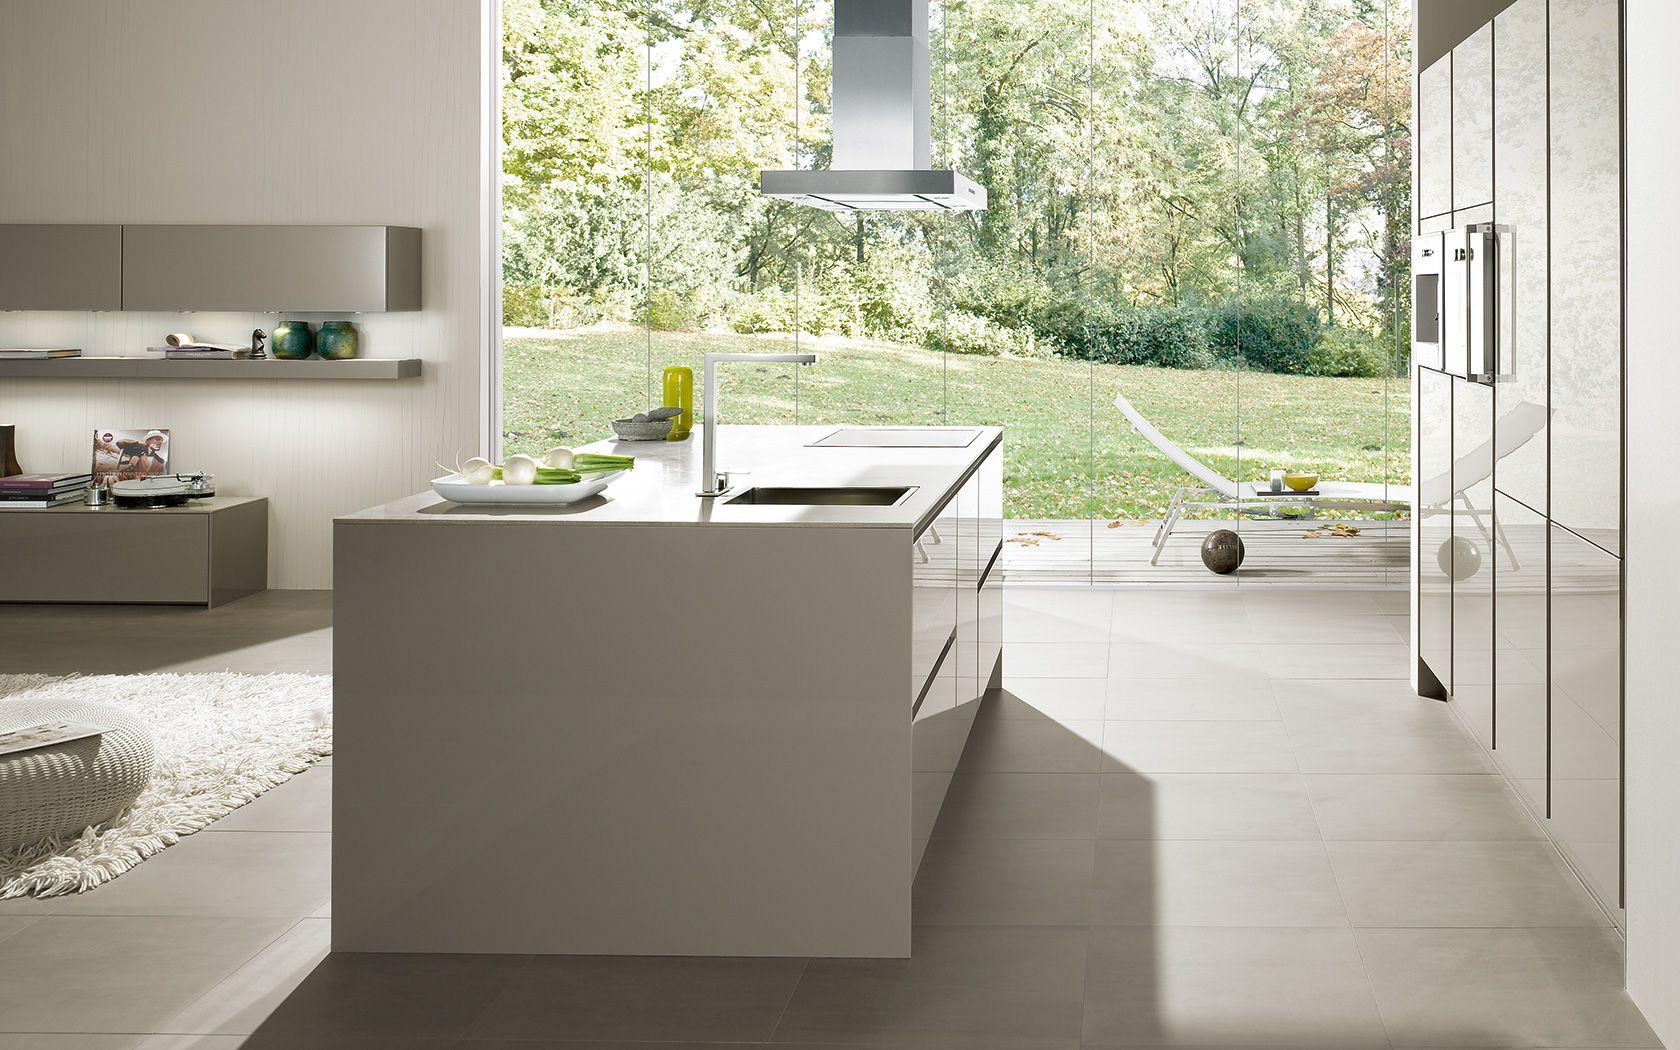 Moderne Küche ohne Griff S2 | siematic.de | architecture_inside ...